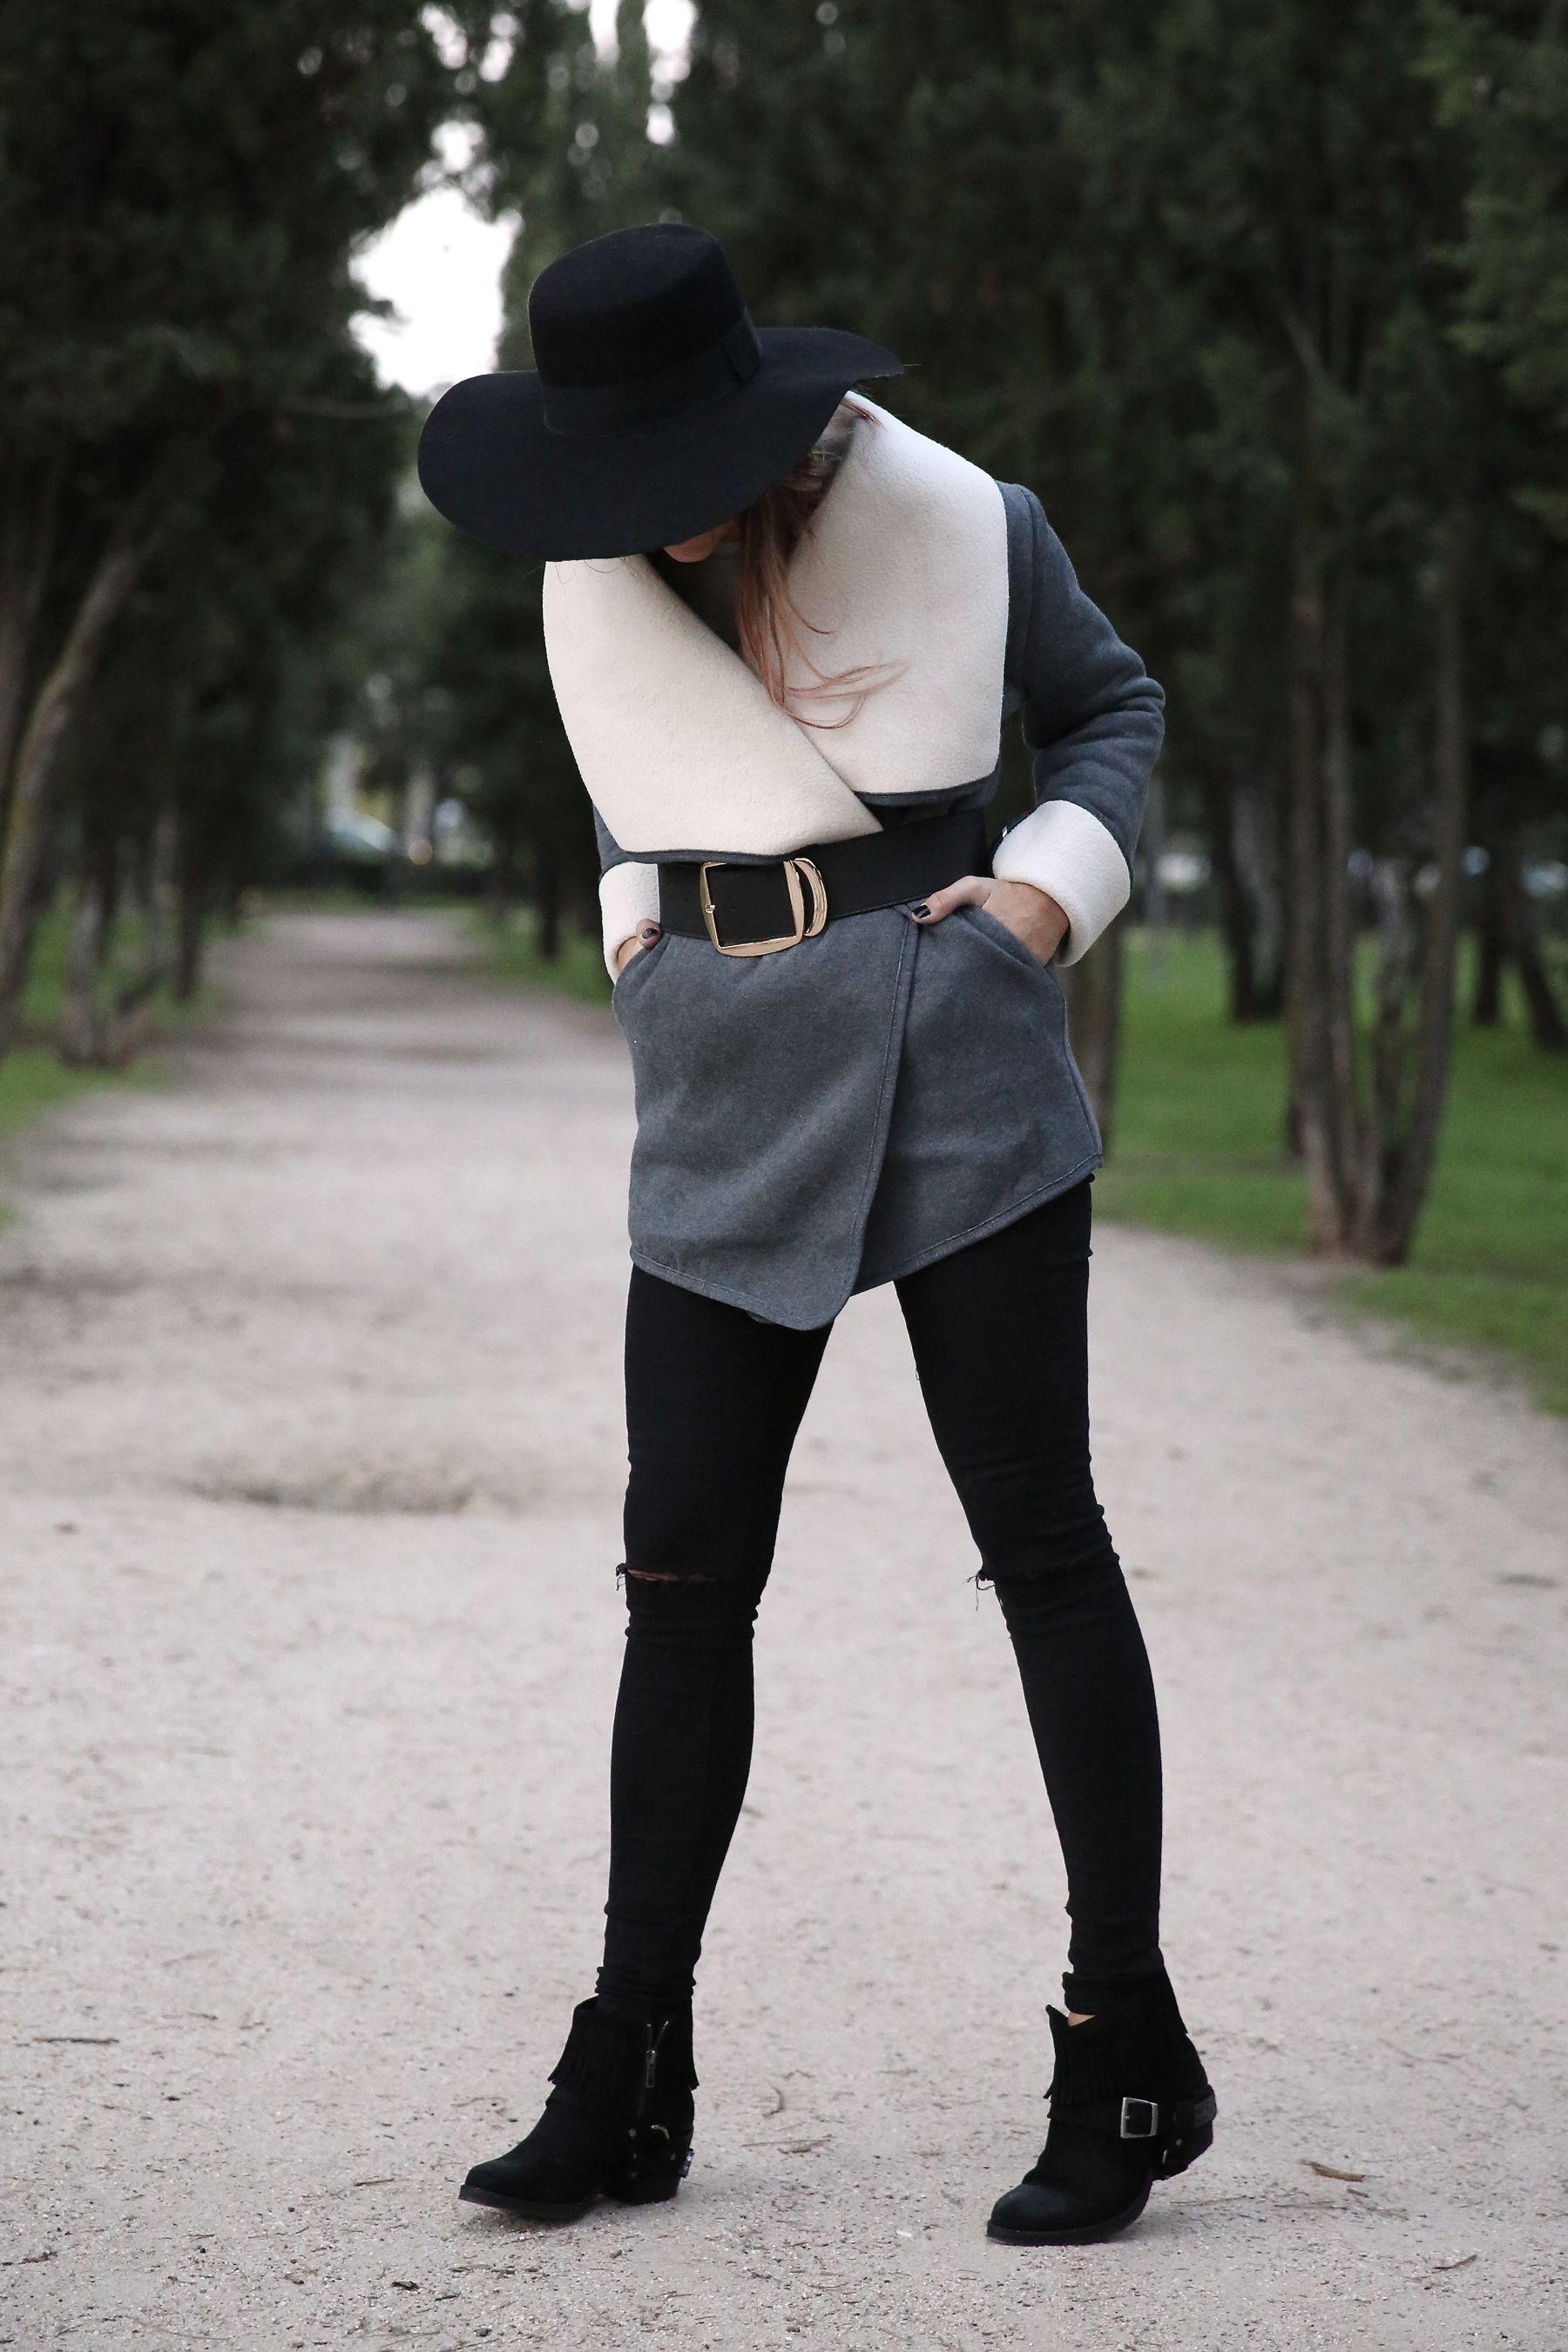 trendy_taste-look-outfit-street_style-ootd-blog-blogger-fashion_spain-moda_españa-abrigo_borrego-borreguillo-otoño-frio-cold-hat-sombrero-boho-hippie-steve_madden-skinny_jeans-pitillos-fall-5